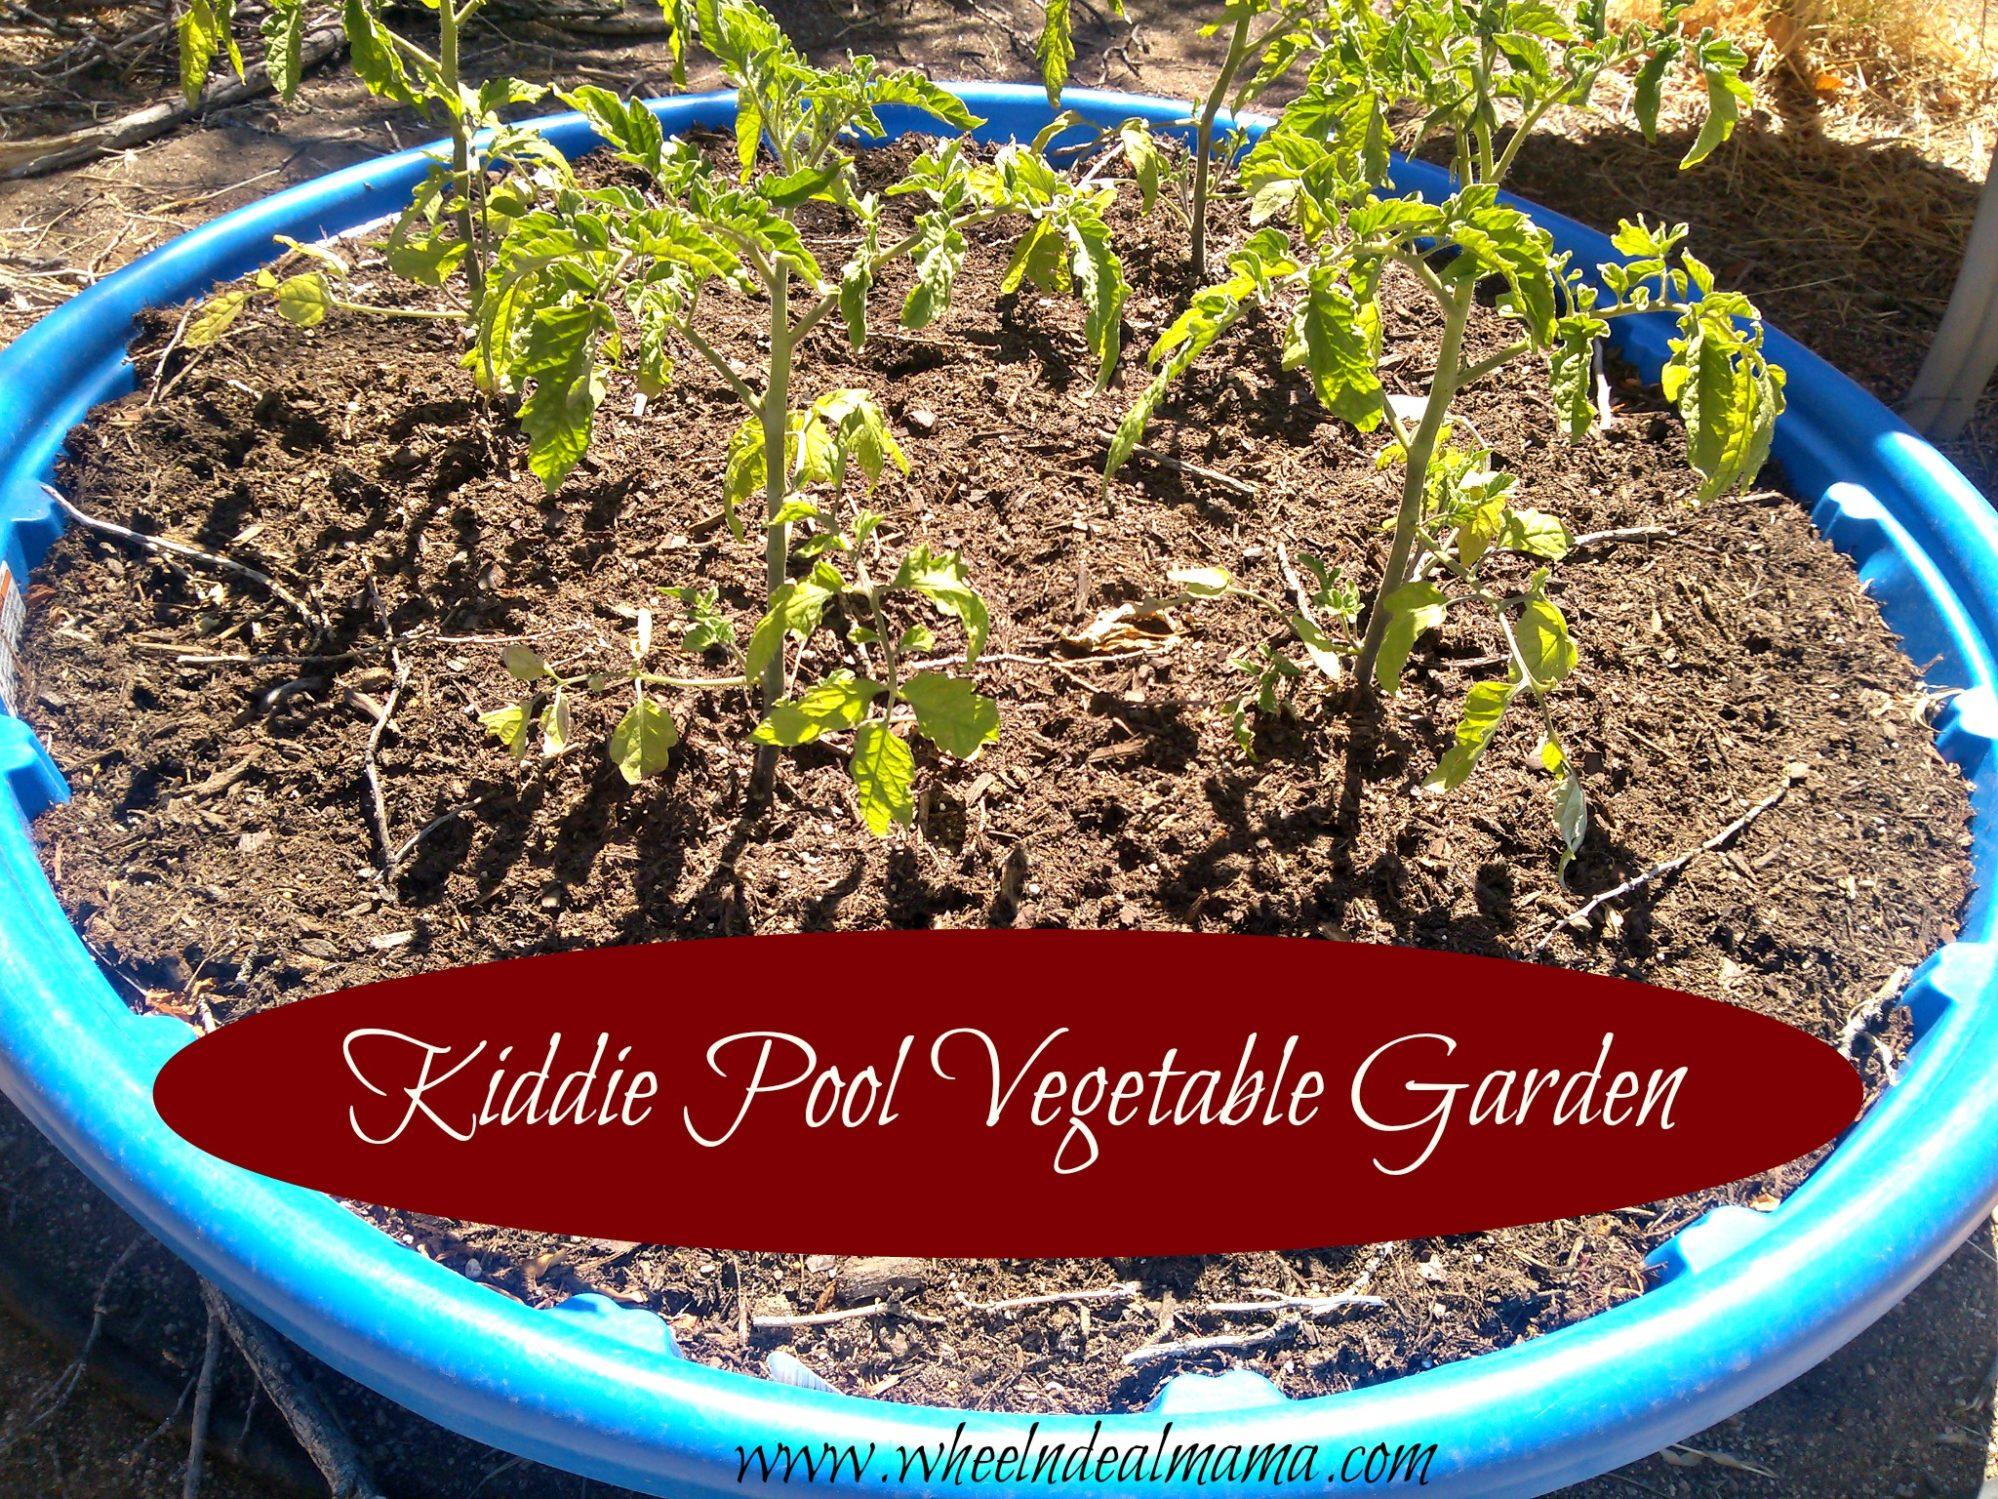 Do-It-Yourself: Kiddie Pool Vegetable Garden! - Wheel N Deal Mama